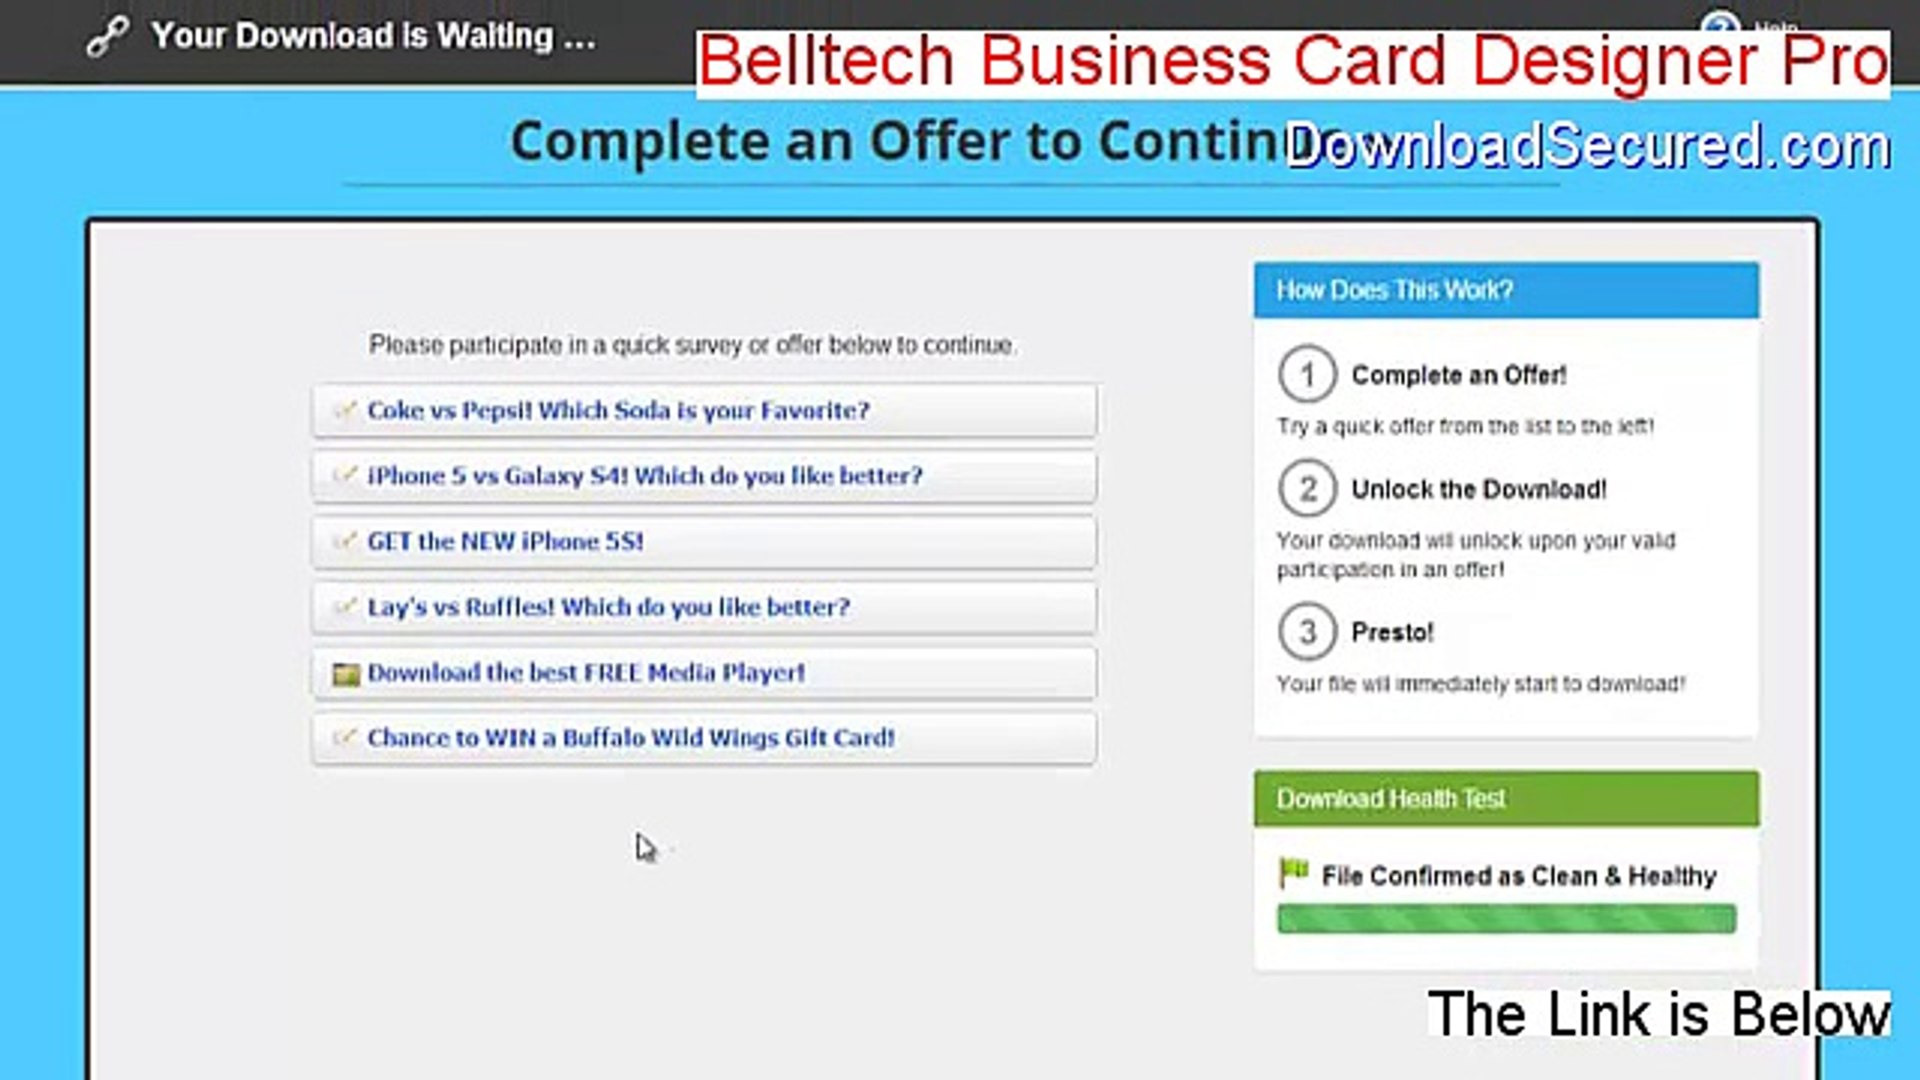 belltech business card designer pro license code free